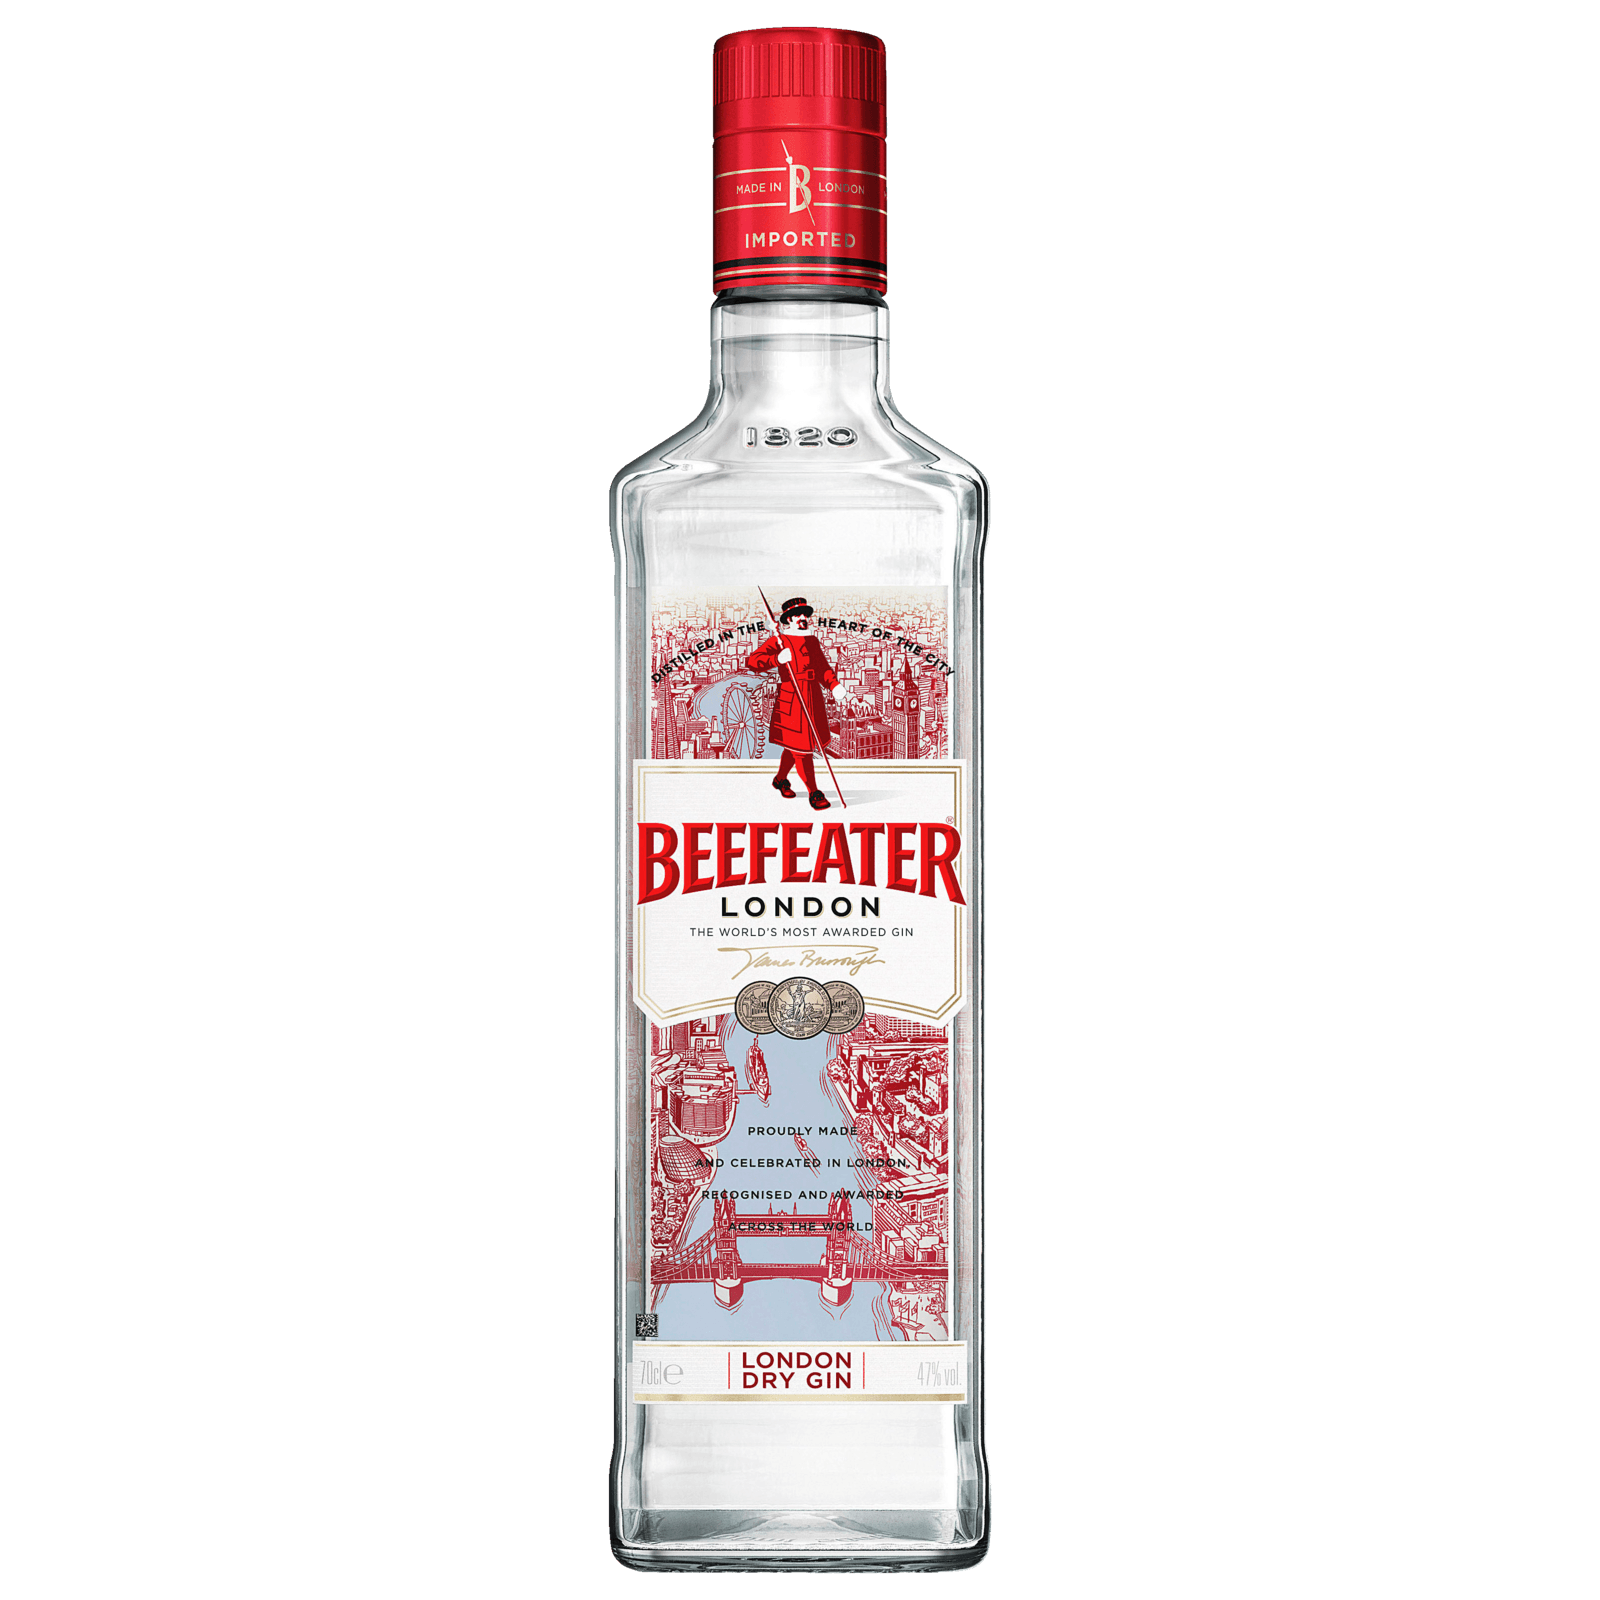 Beefeater London Dry Gin 0,7l bei REWE online bestellen!